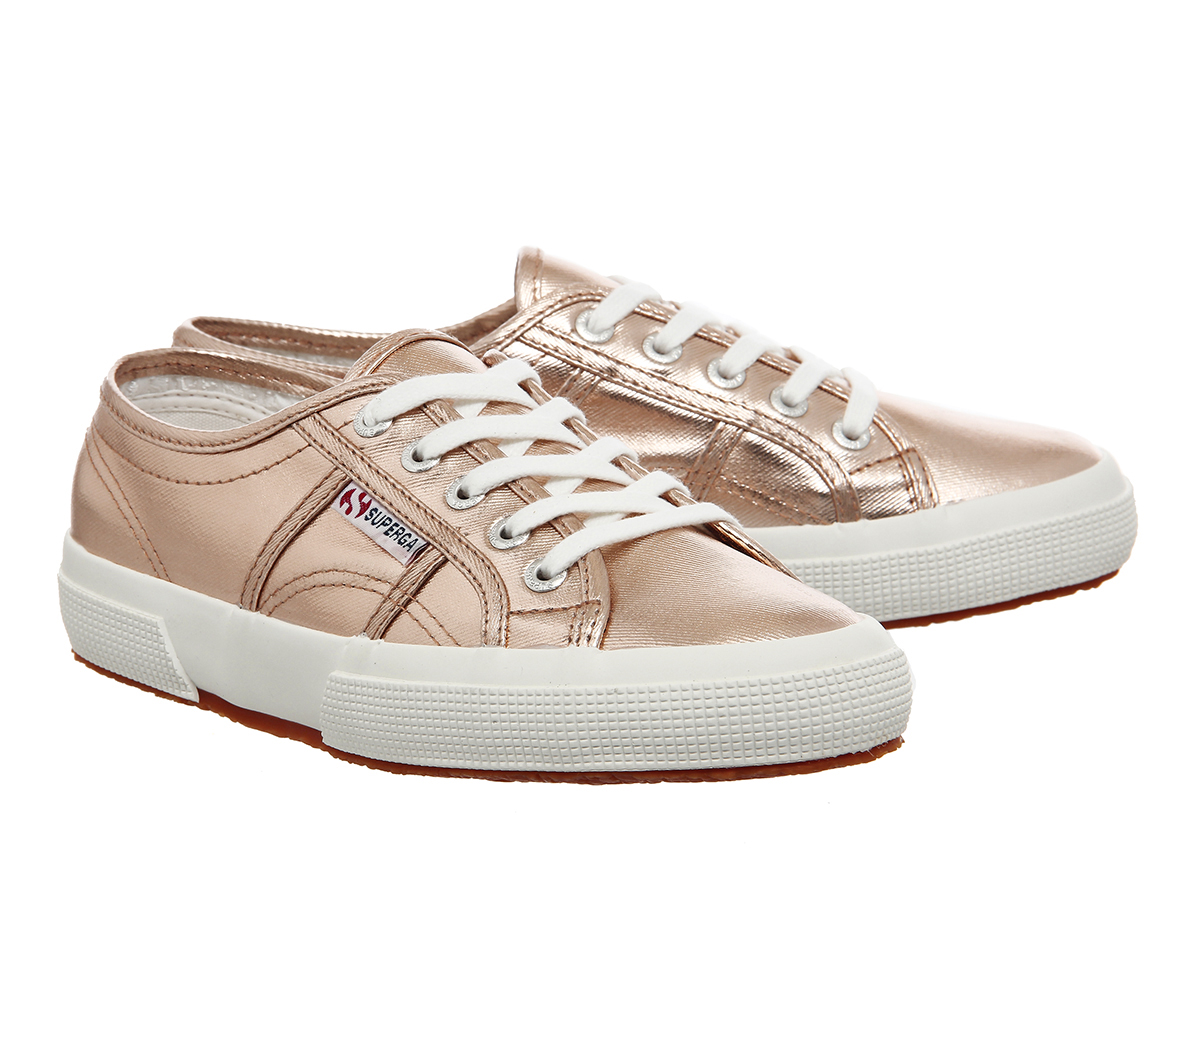 Sentinel Womens Superga 2750 Trainers ROSE GOLD COMETU Trainers Shoes 965567a80d